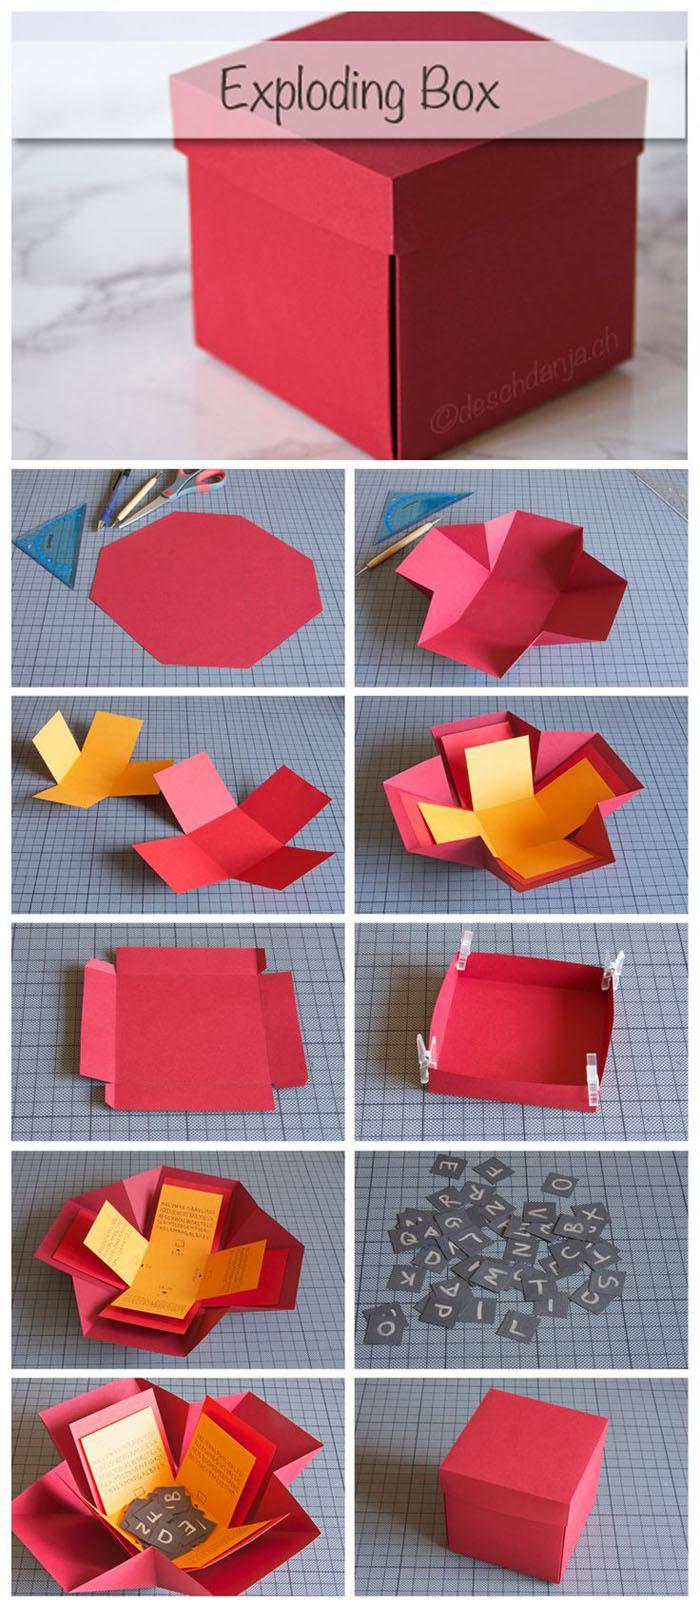 geschnkbox basteln geschnkideen diy deko upcycling ideen tasse selber gestalten box rot